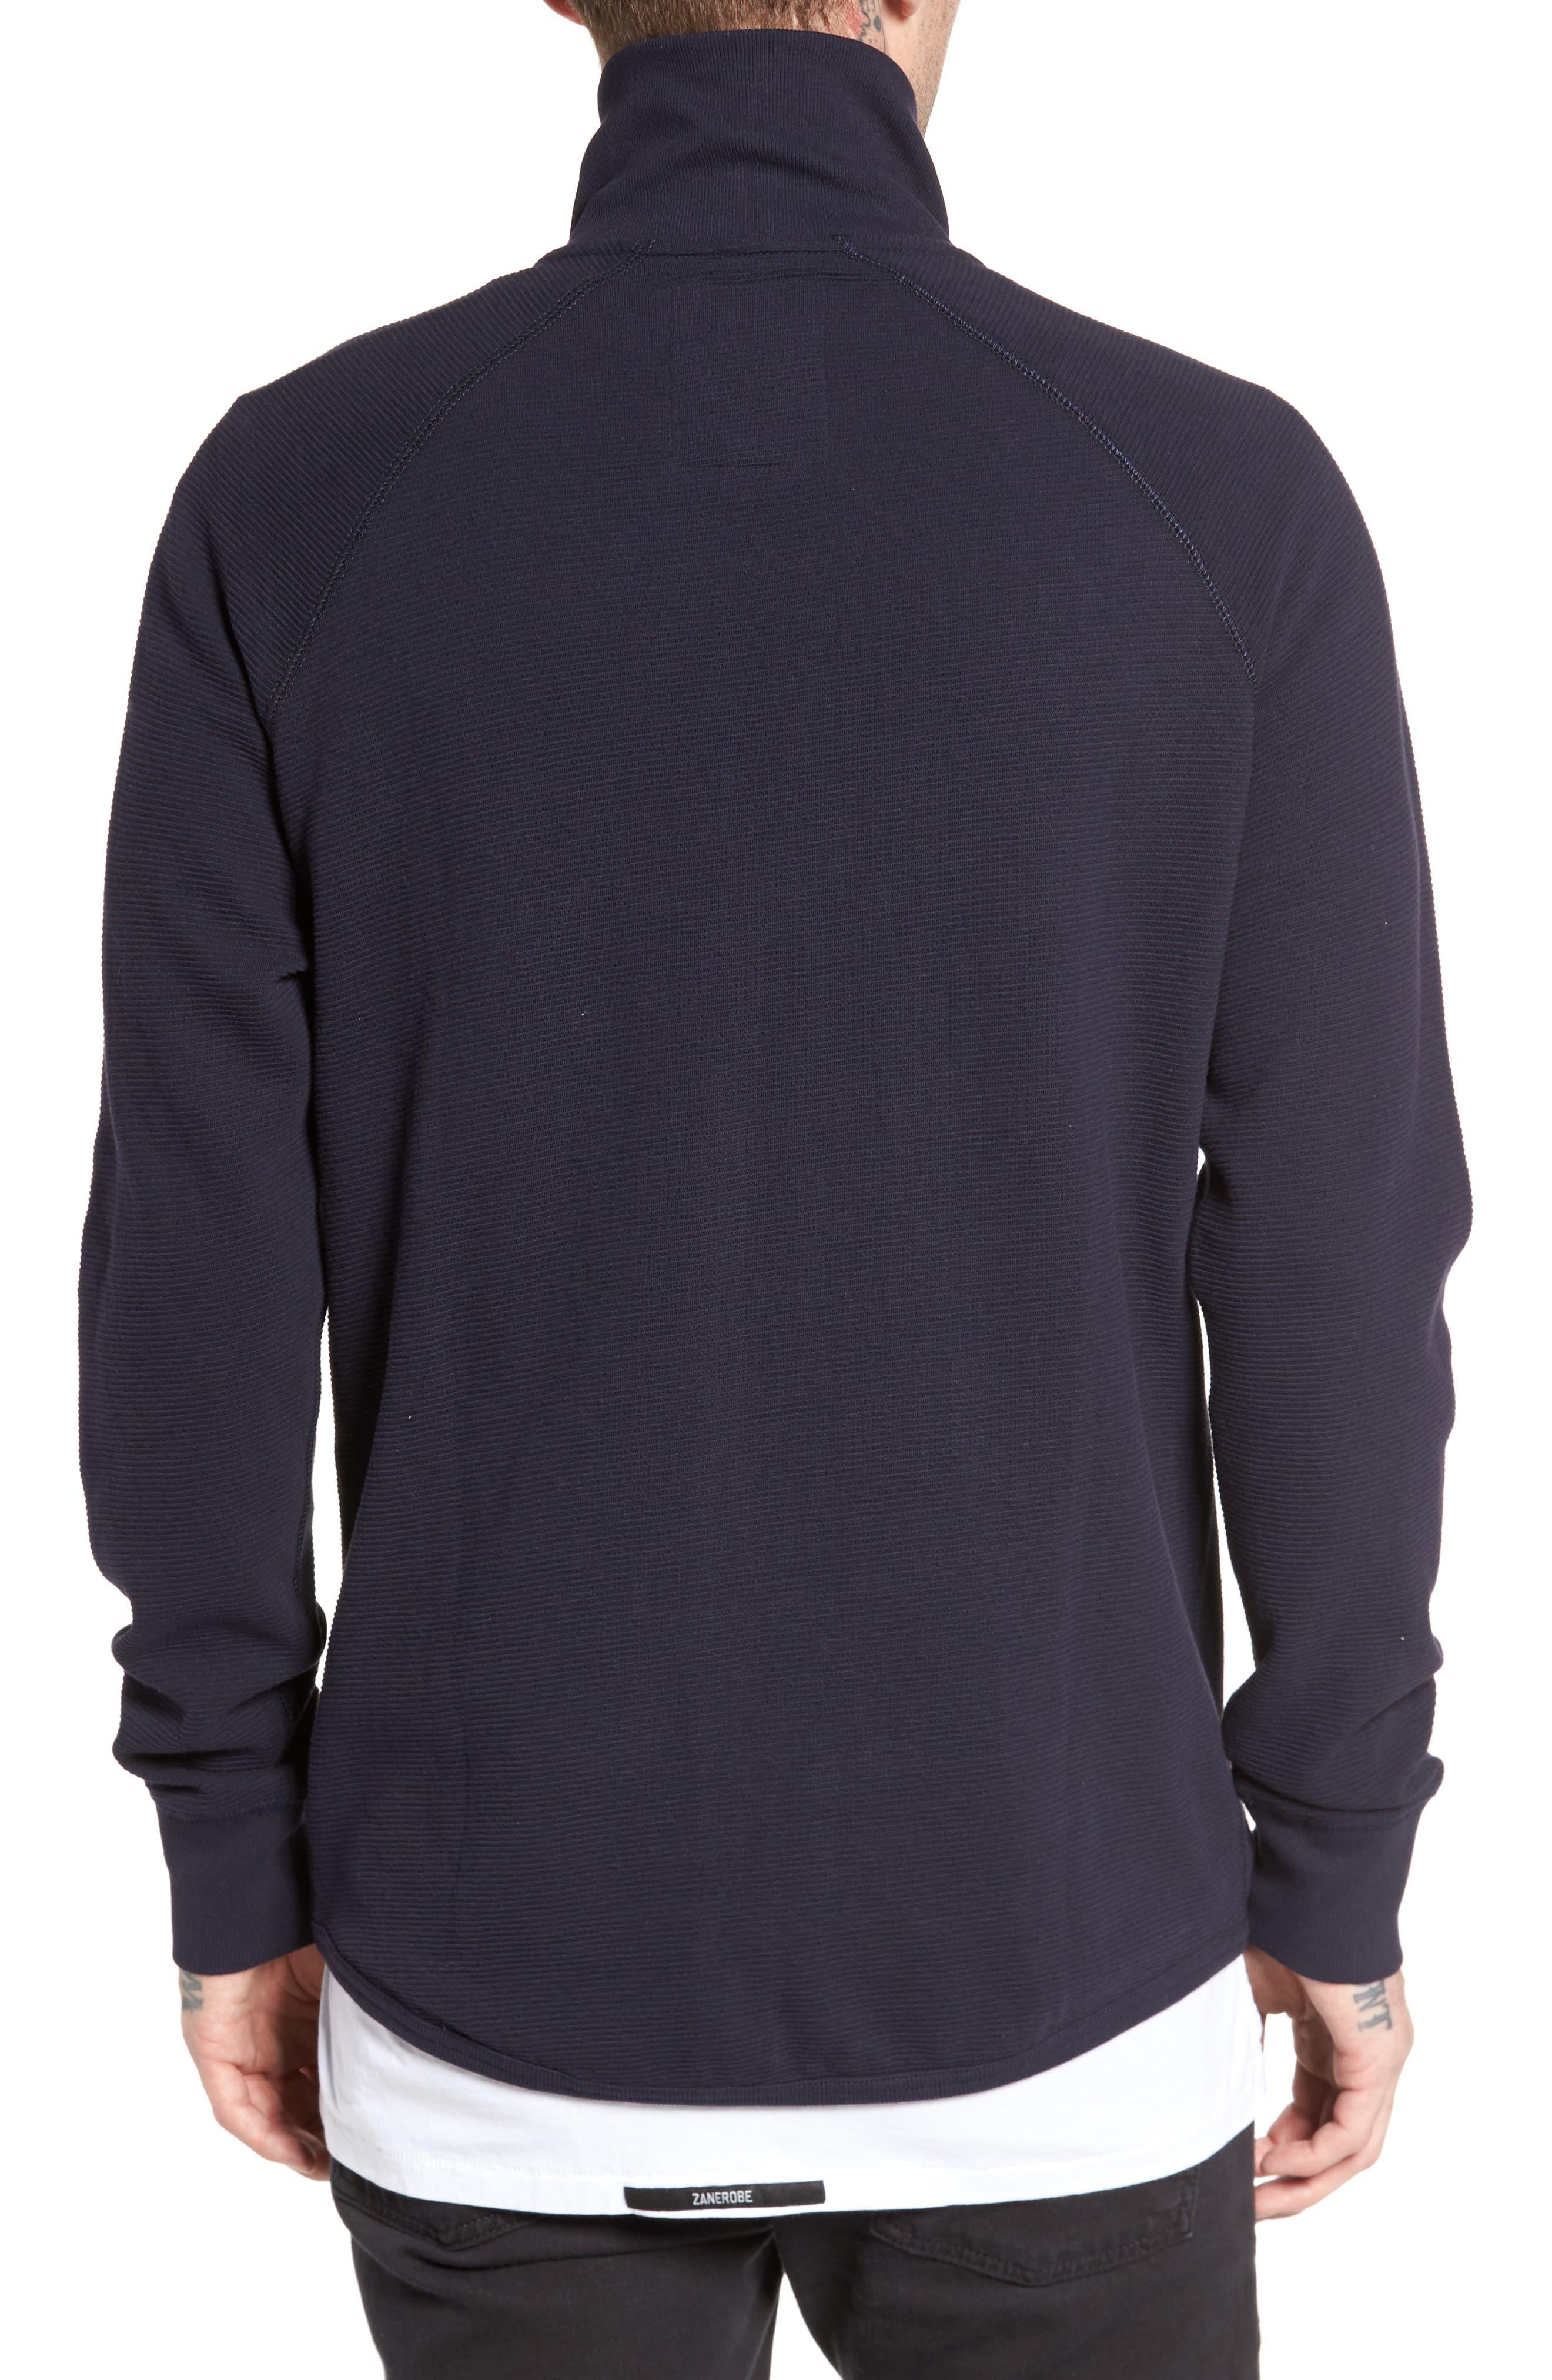 Jirgi Zip Front Jacket,                             Alternate thumbnail 2, color,                             Dark Naval Blue